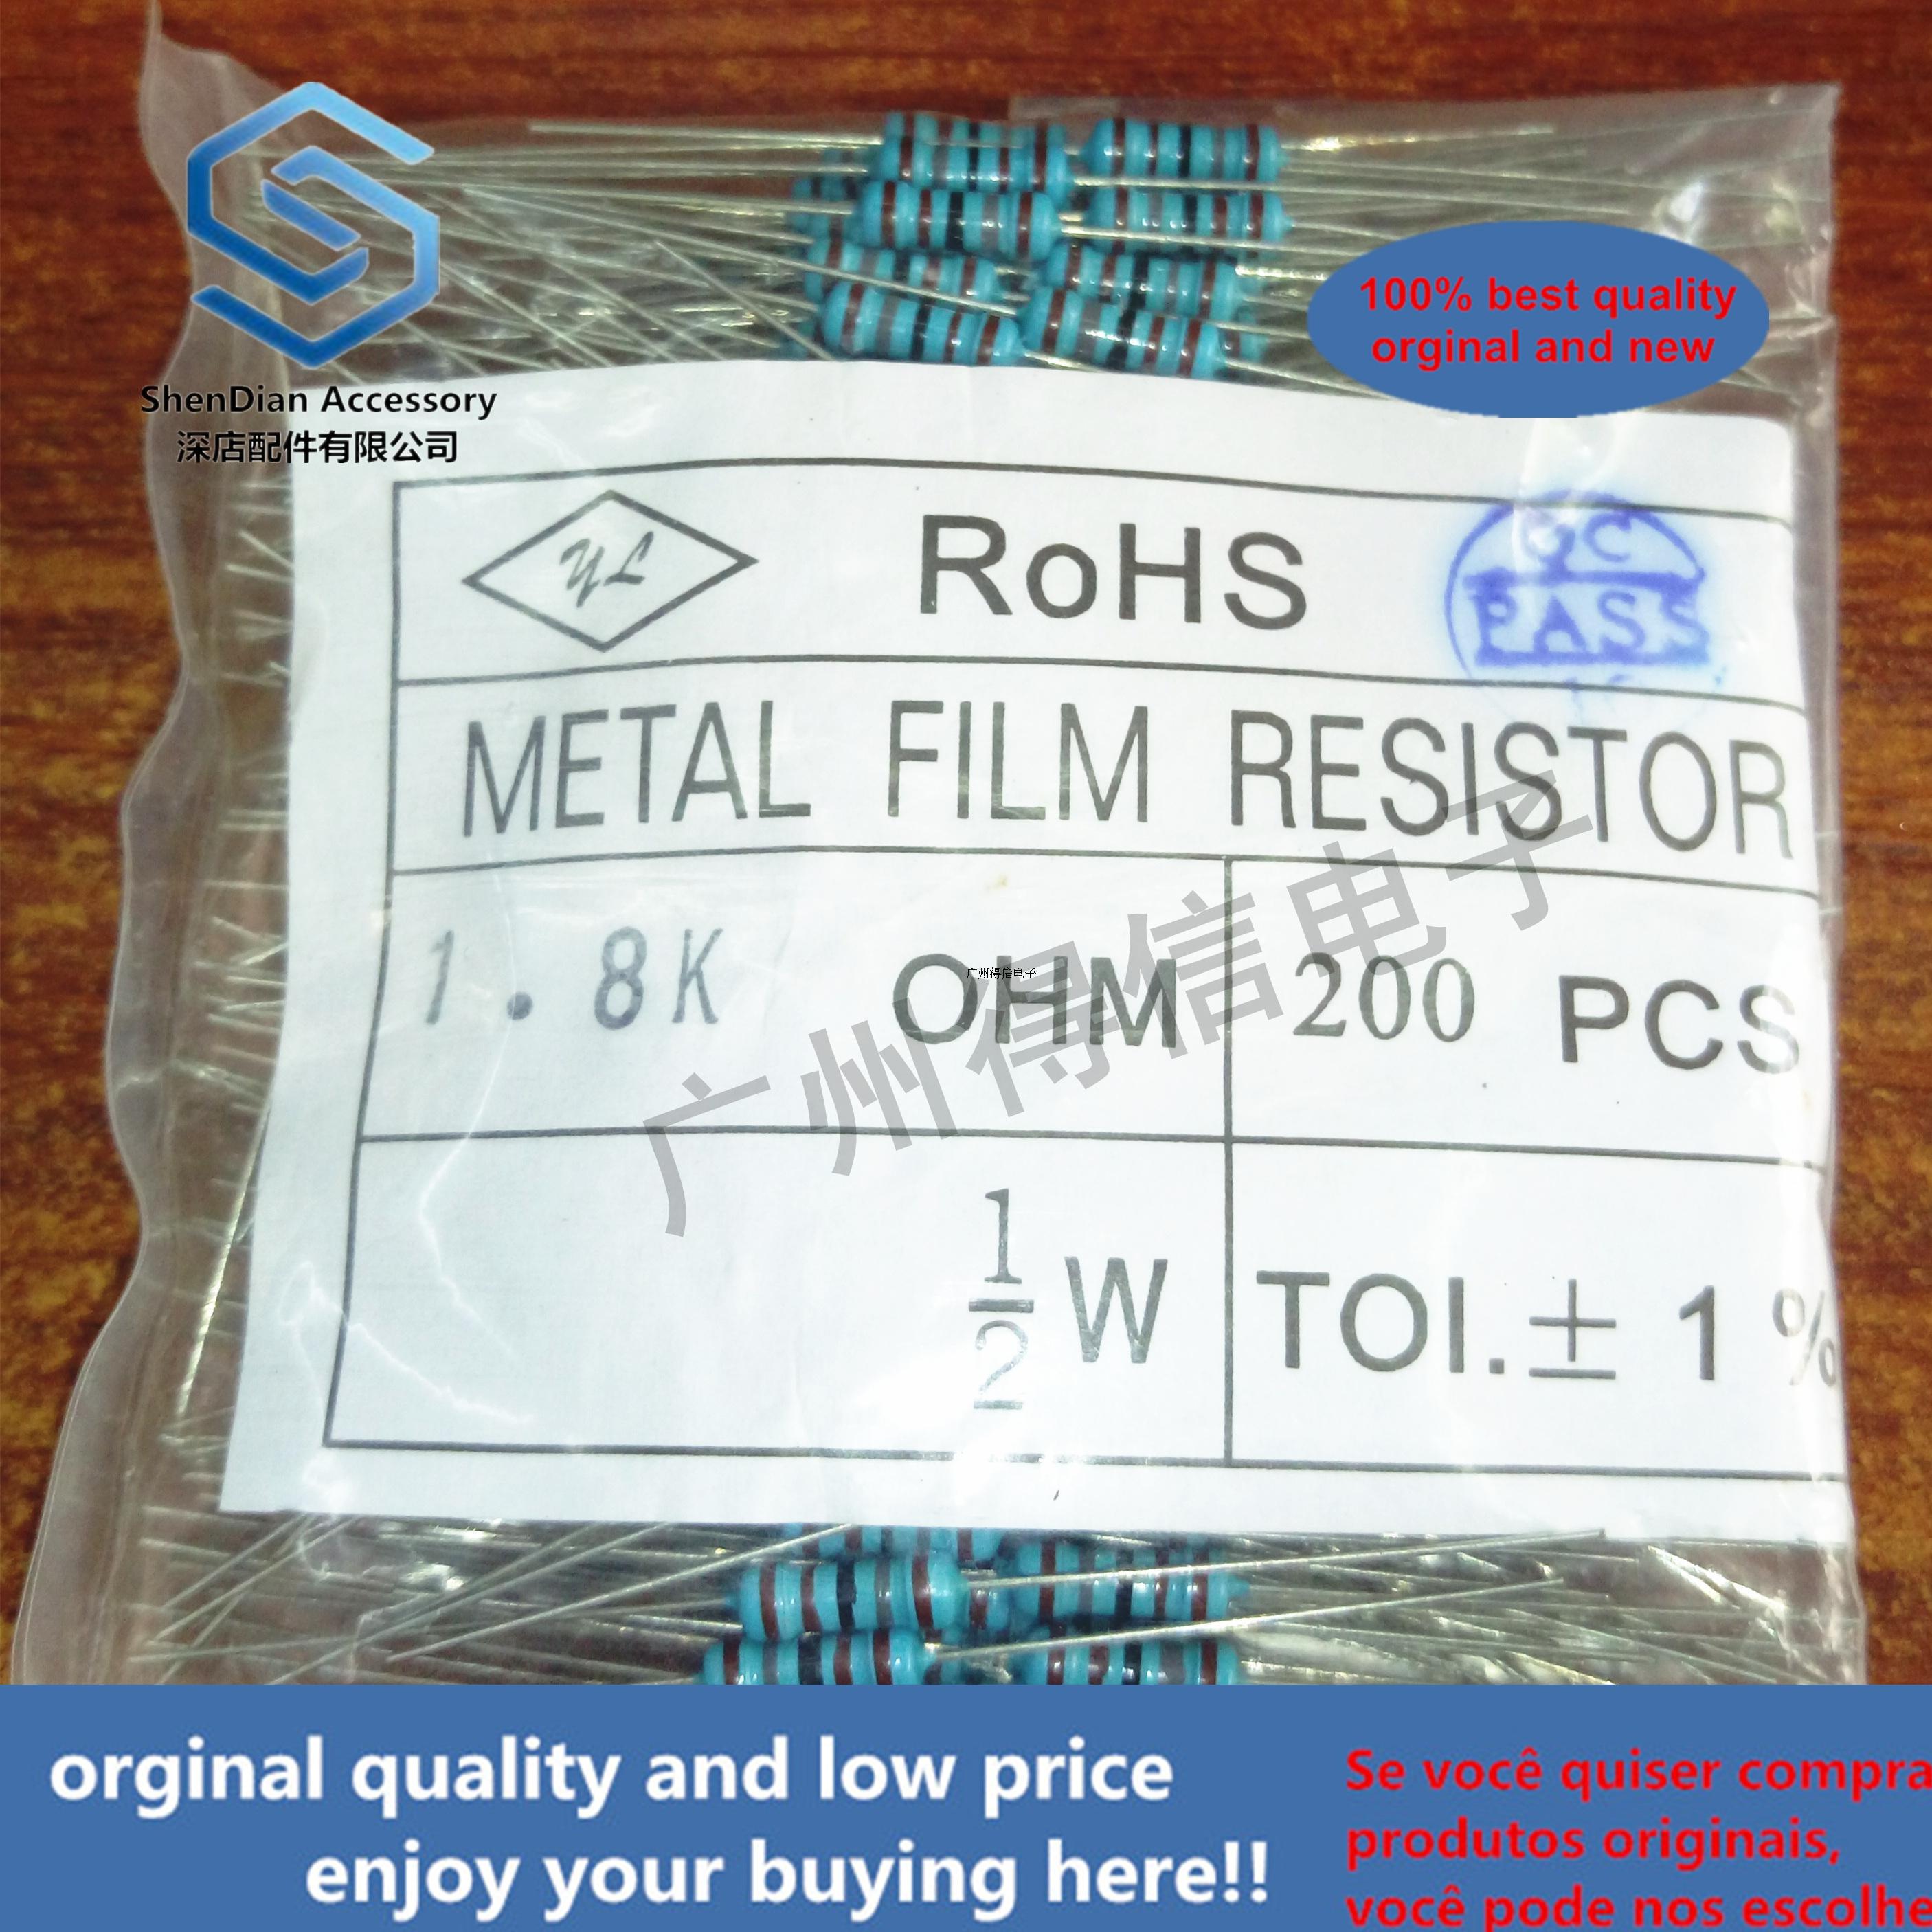 200pcs 1 / 2W 3.9R 3.9 Euro 1% Brand New Metal Film Iron Feet Resistance Bag 200 Pcs Per Pack